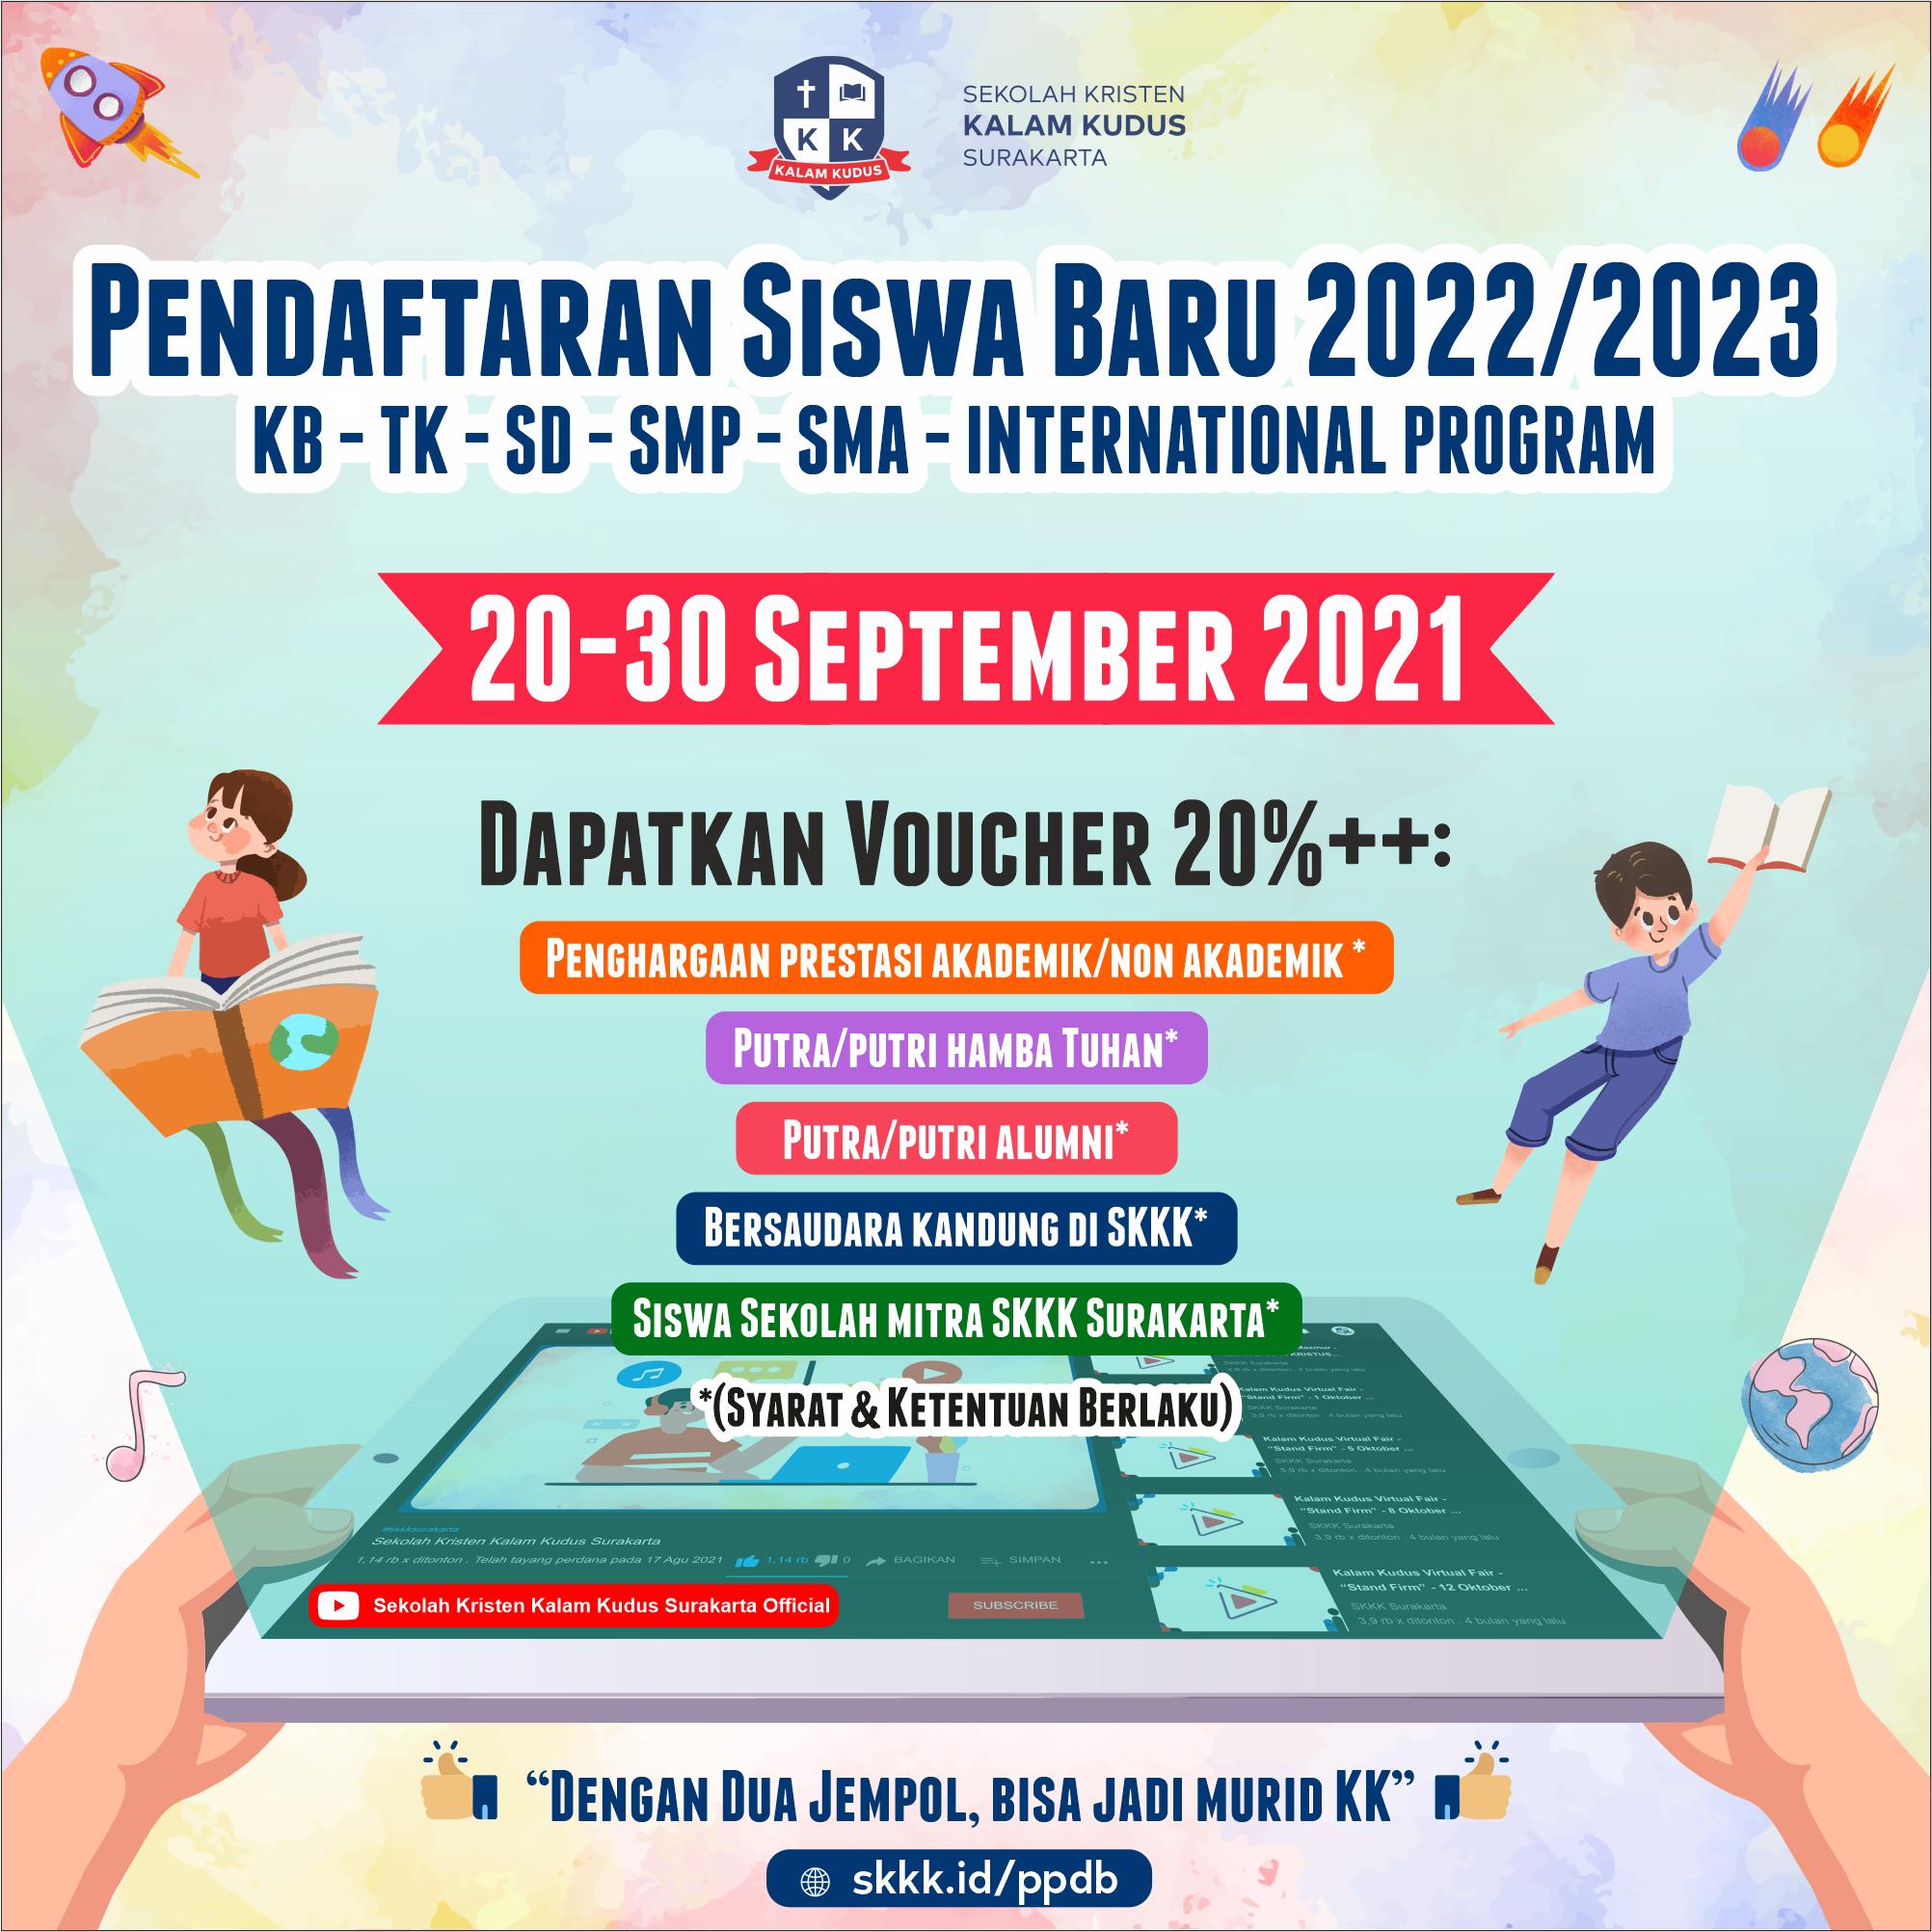 Pendaftaran Siswa Baru Kalam Kudus - Kalam Kudus Virtual Fair 2021